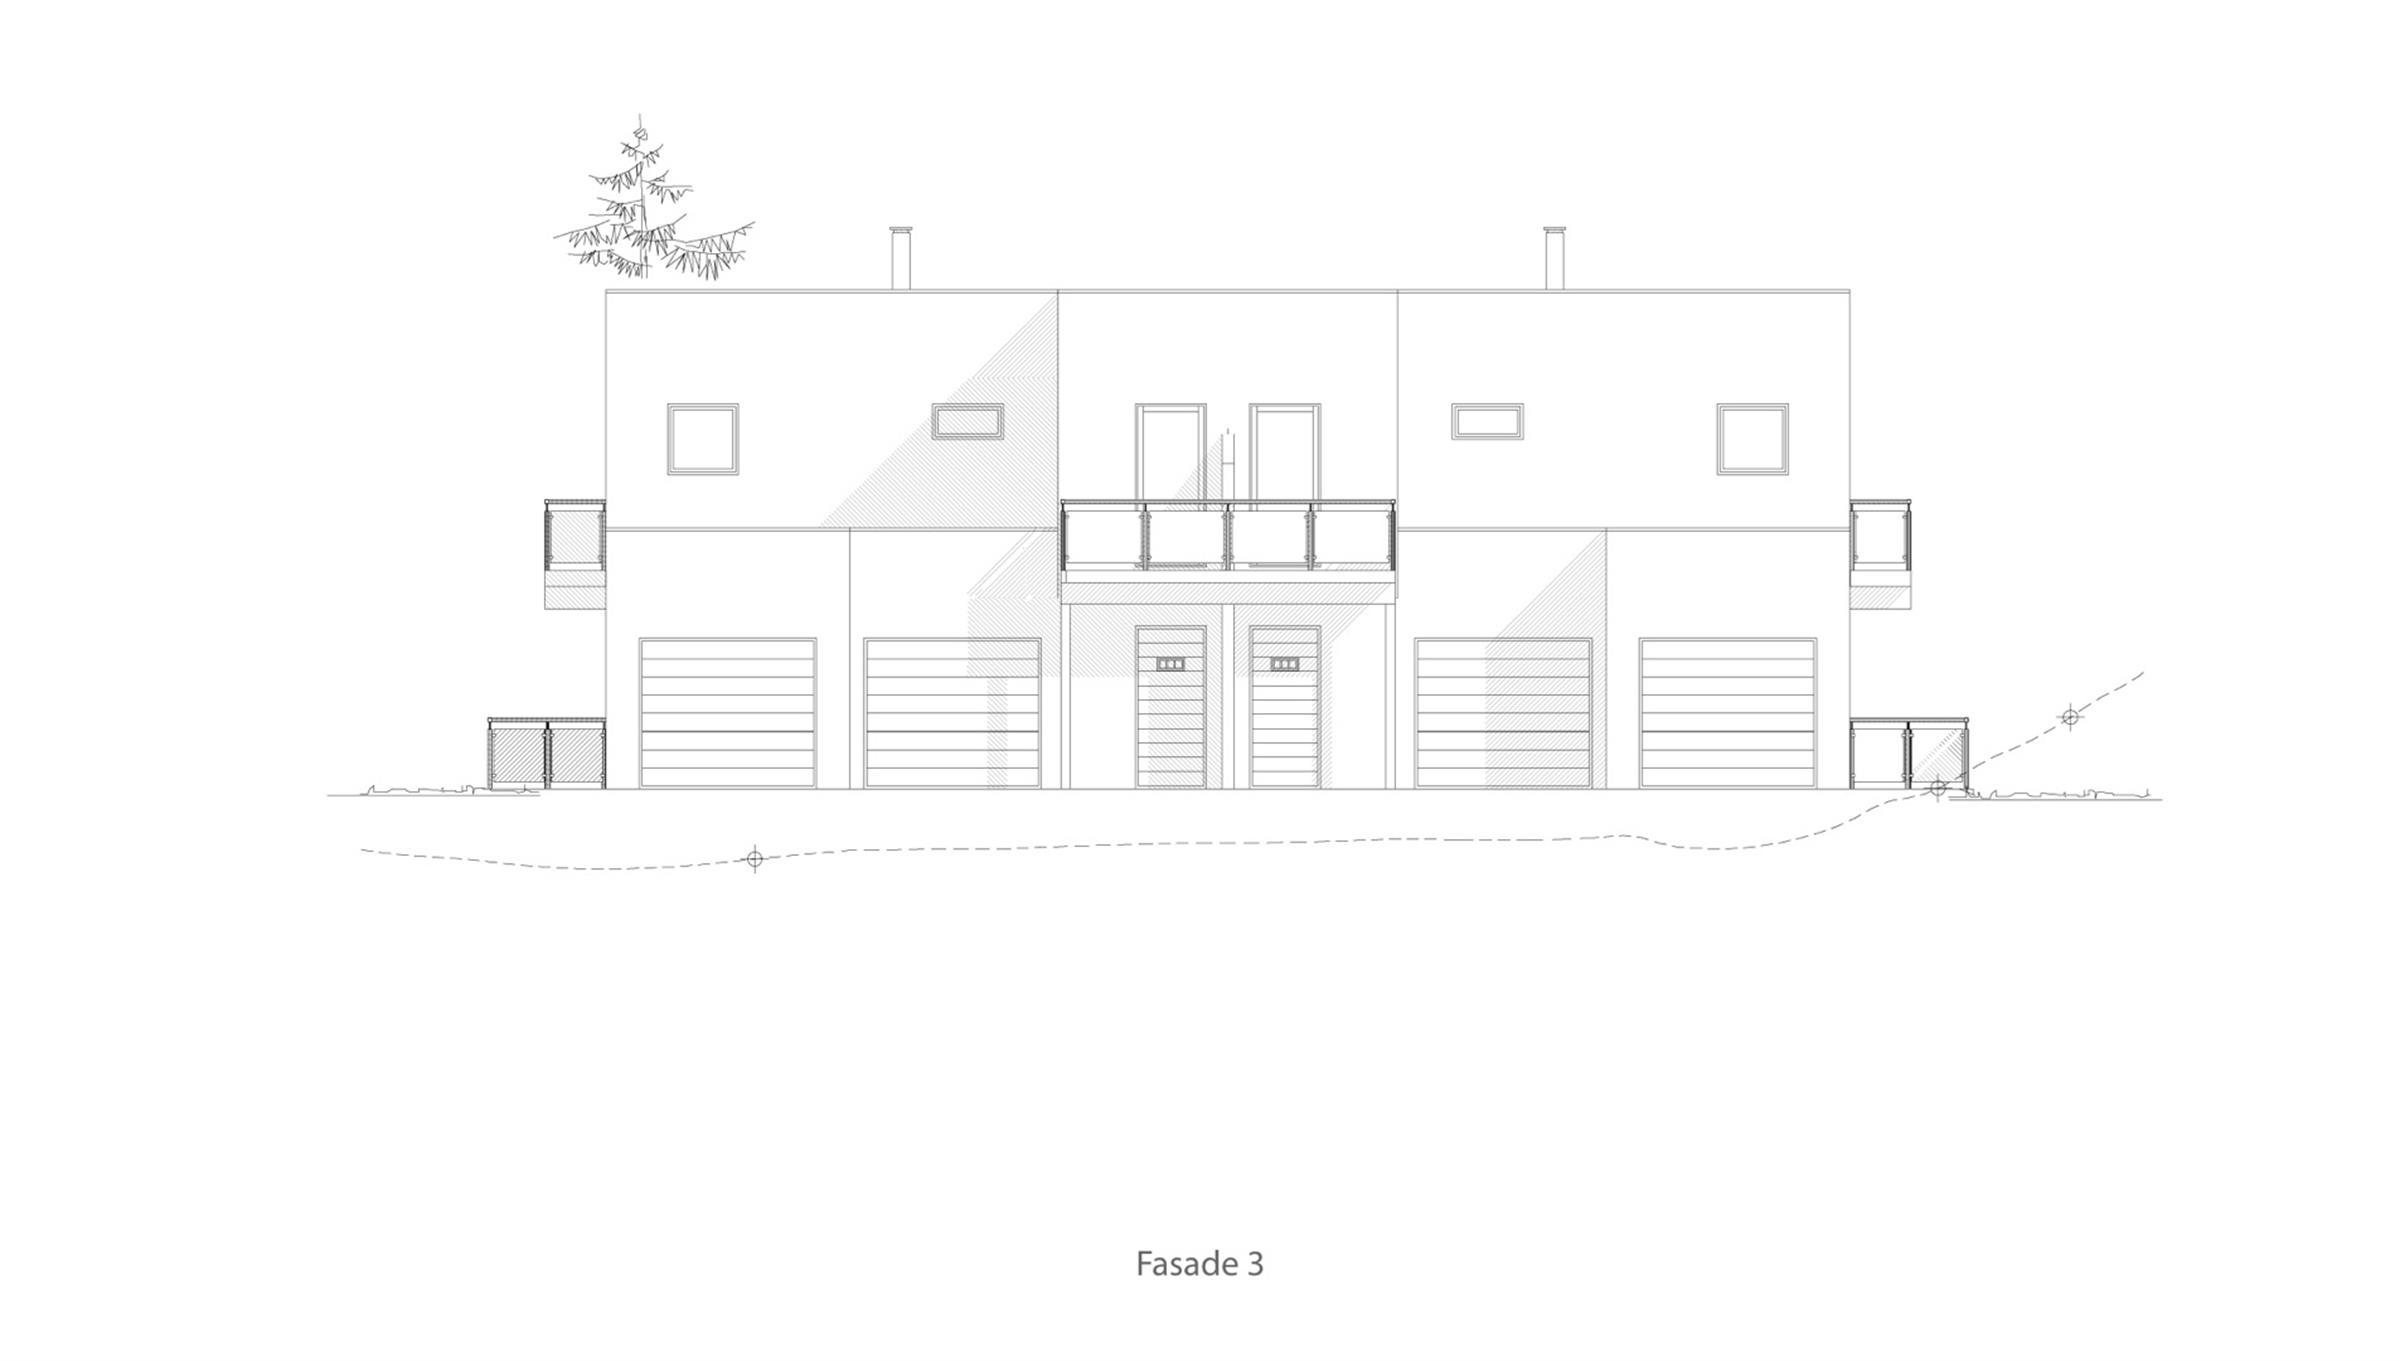 Drammen fasade 3